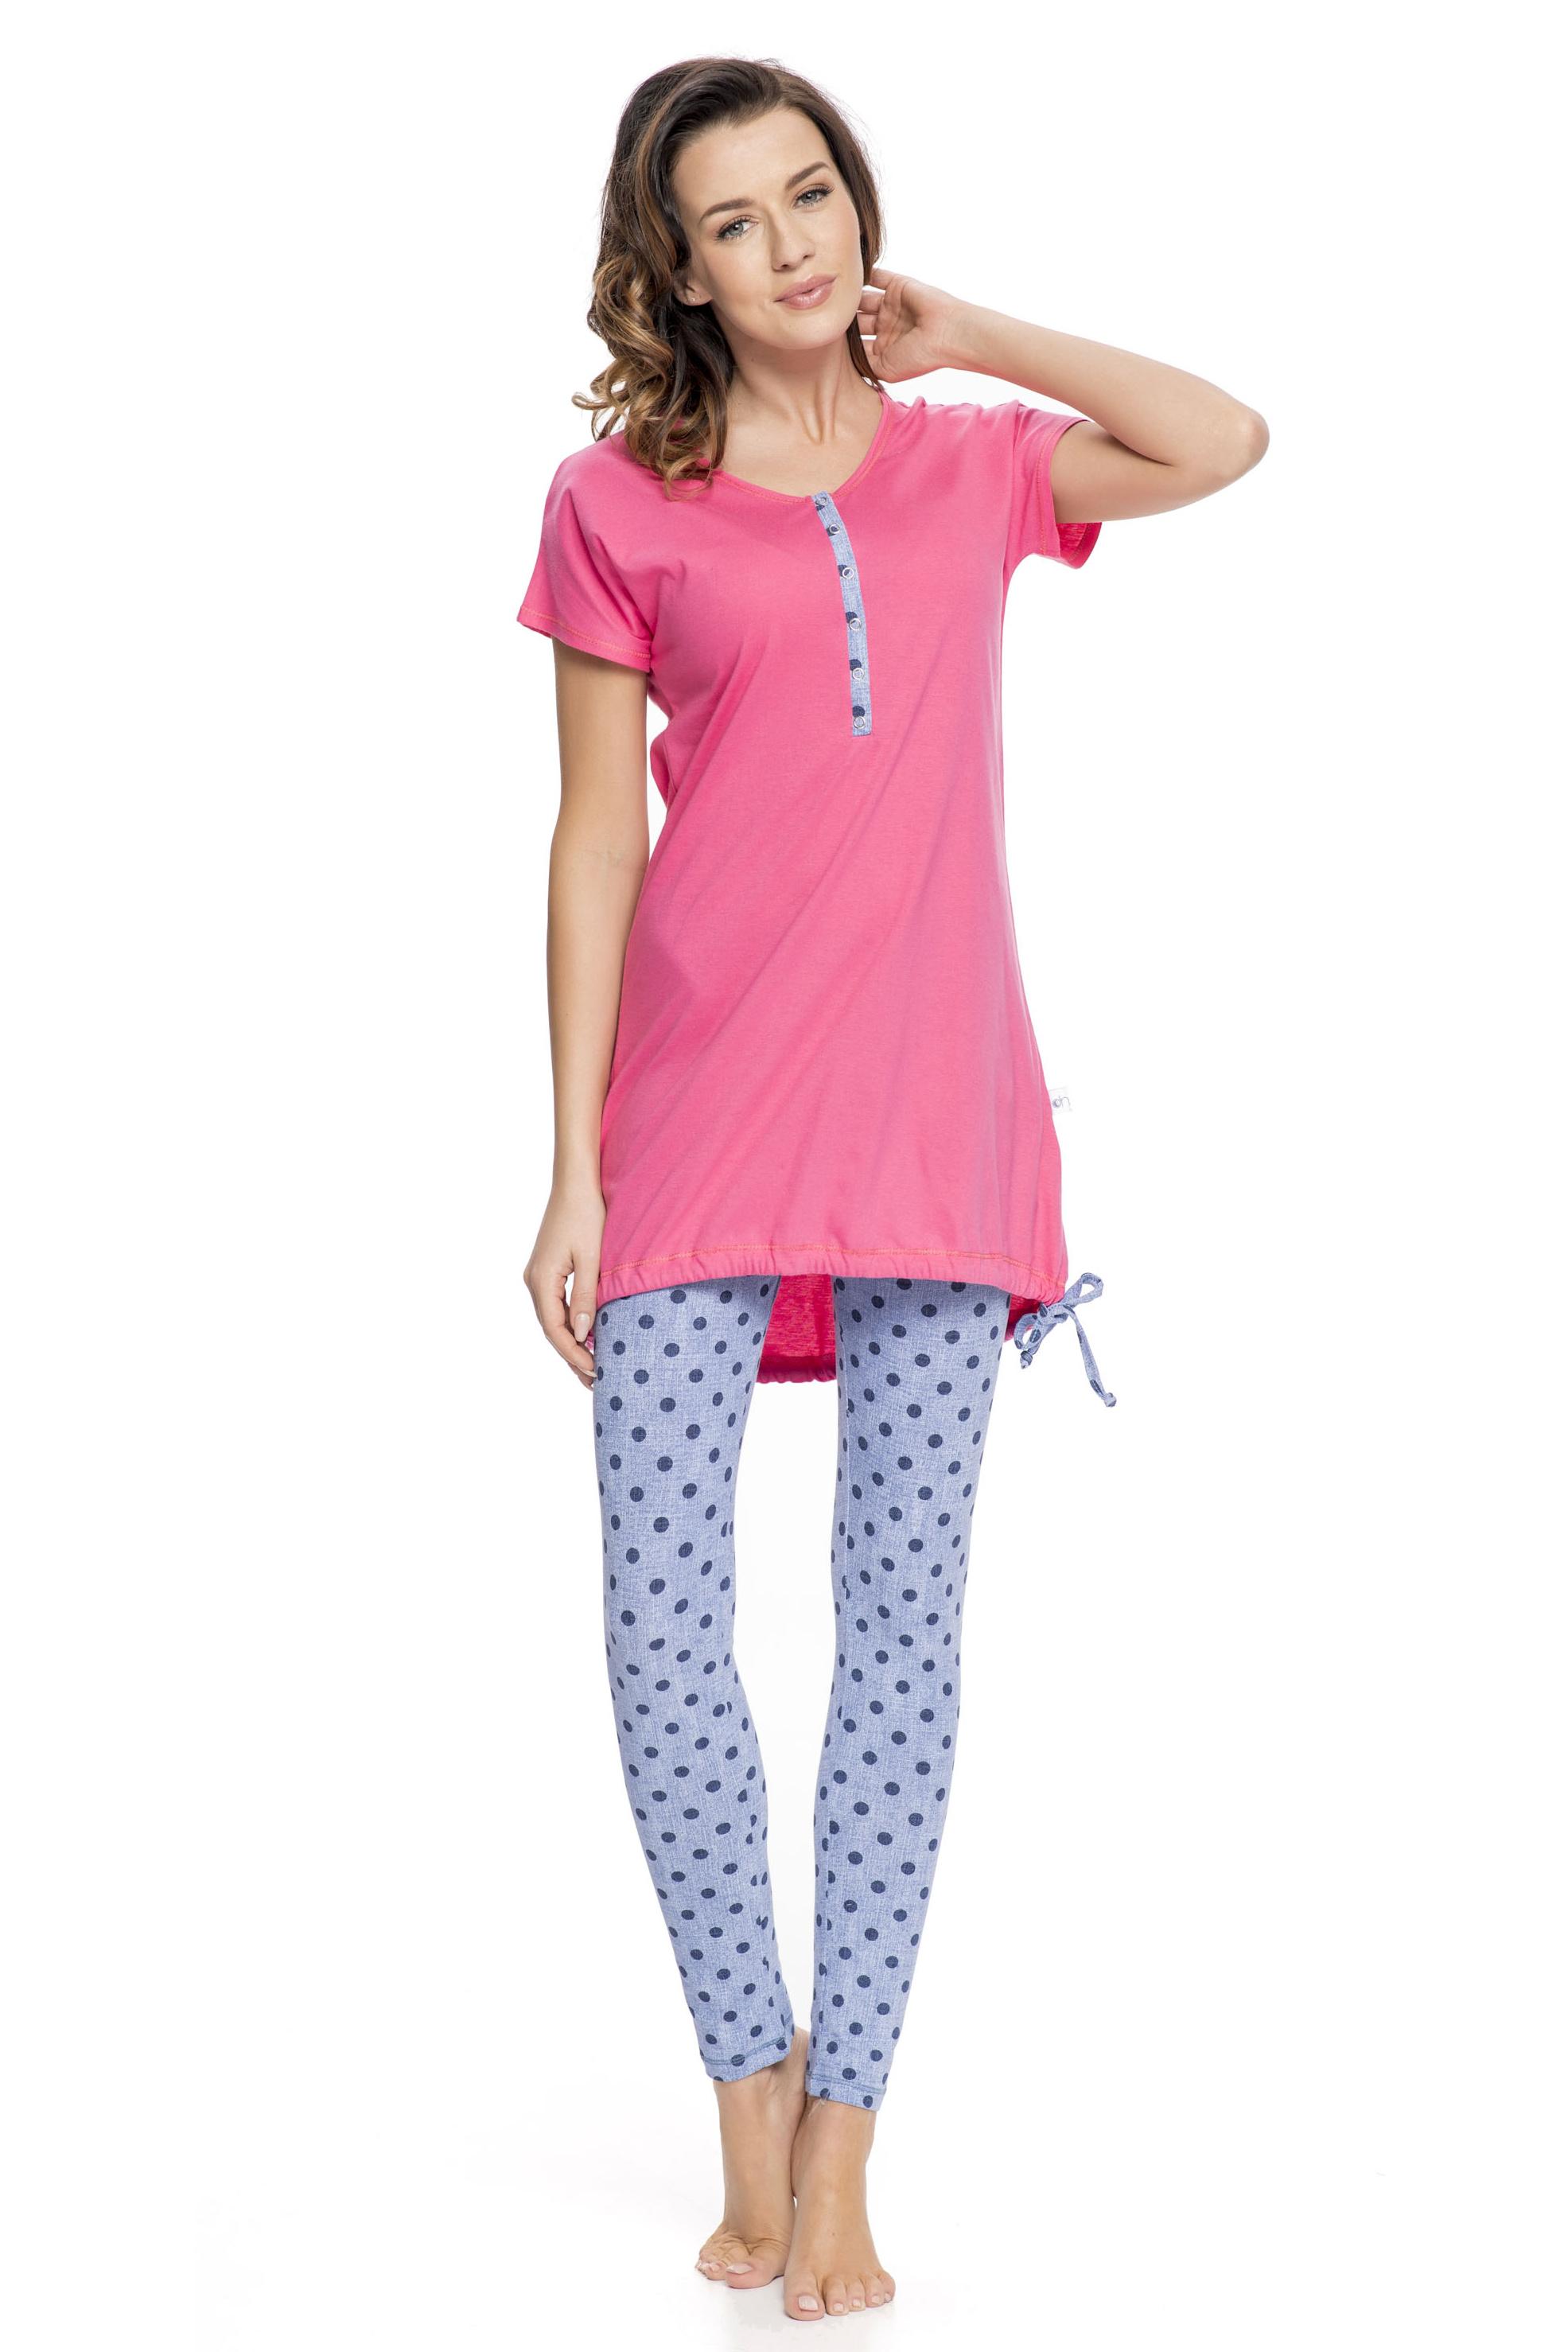 Dámské pyžamo Alaine s legínami - růžová